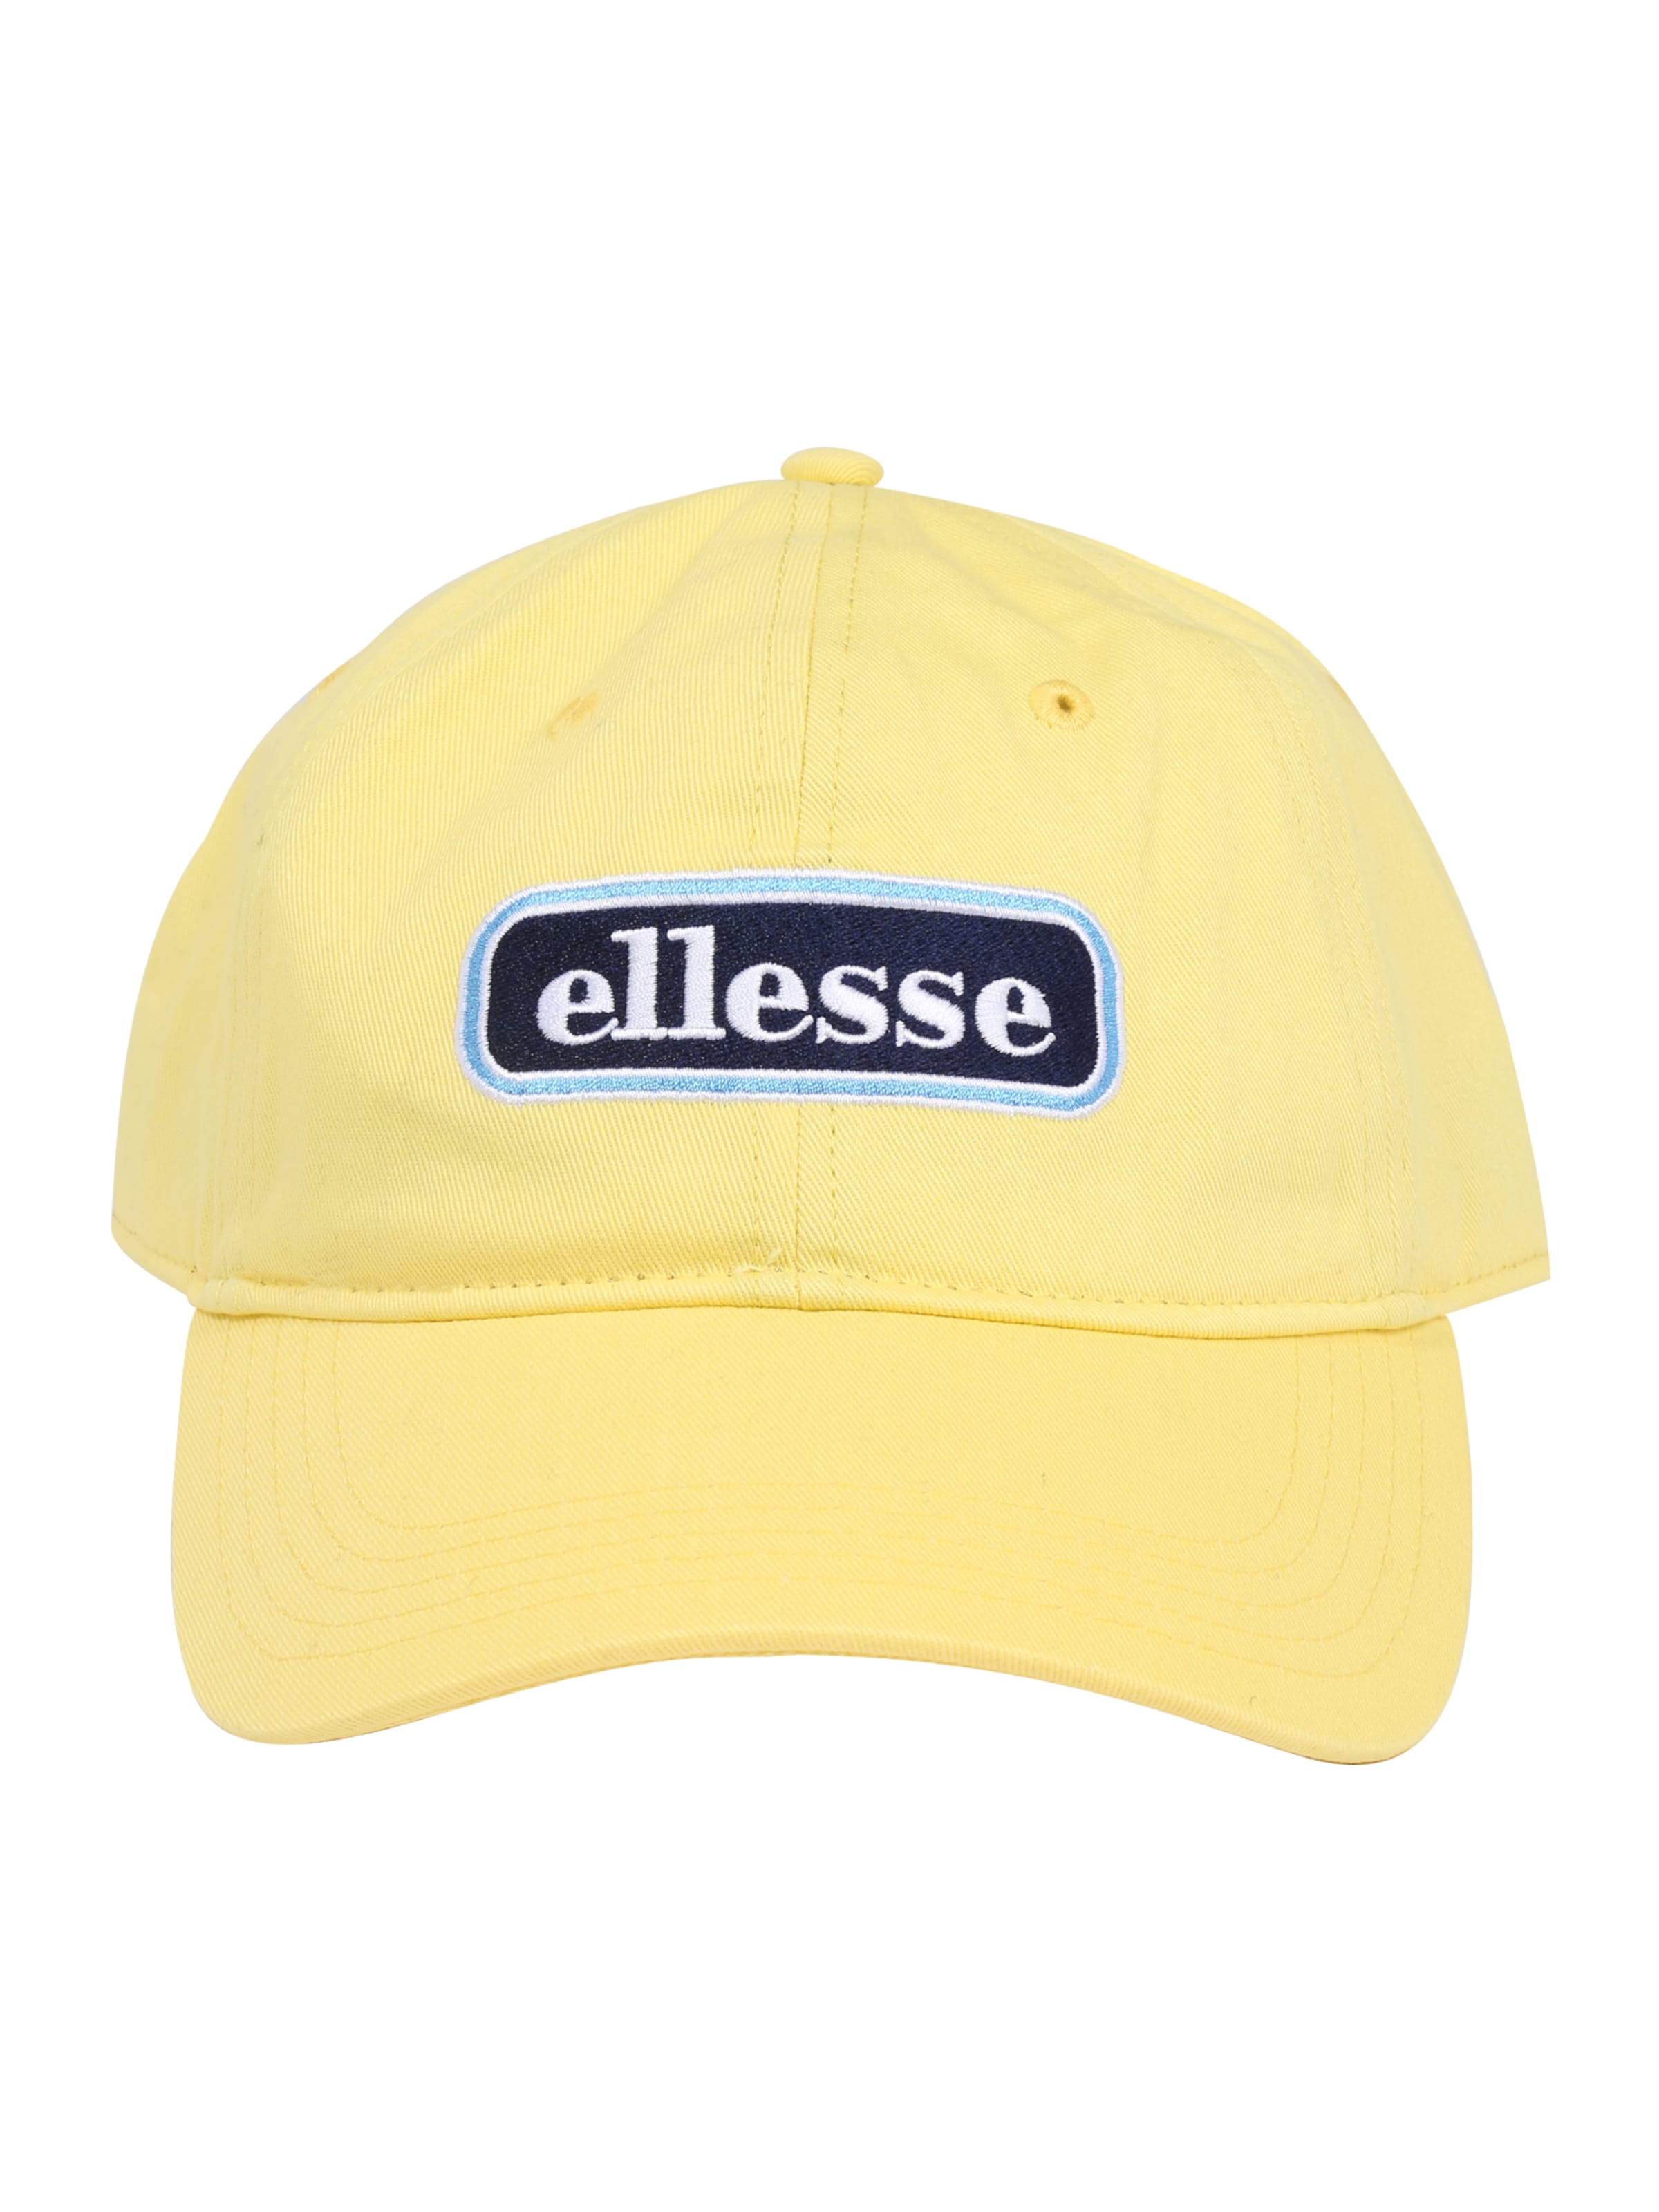 Cap Cap 'jallon' Ellesse 'jallon' 'jallon' In Cap Gelb Ellesse Gelb In Ellesse In KJF3Tcl1